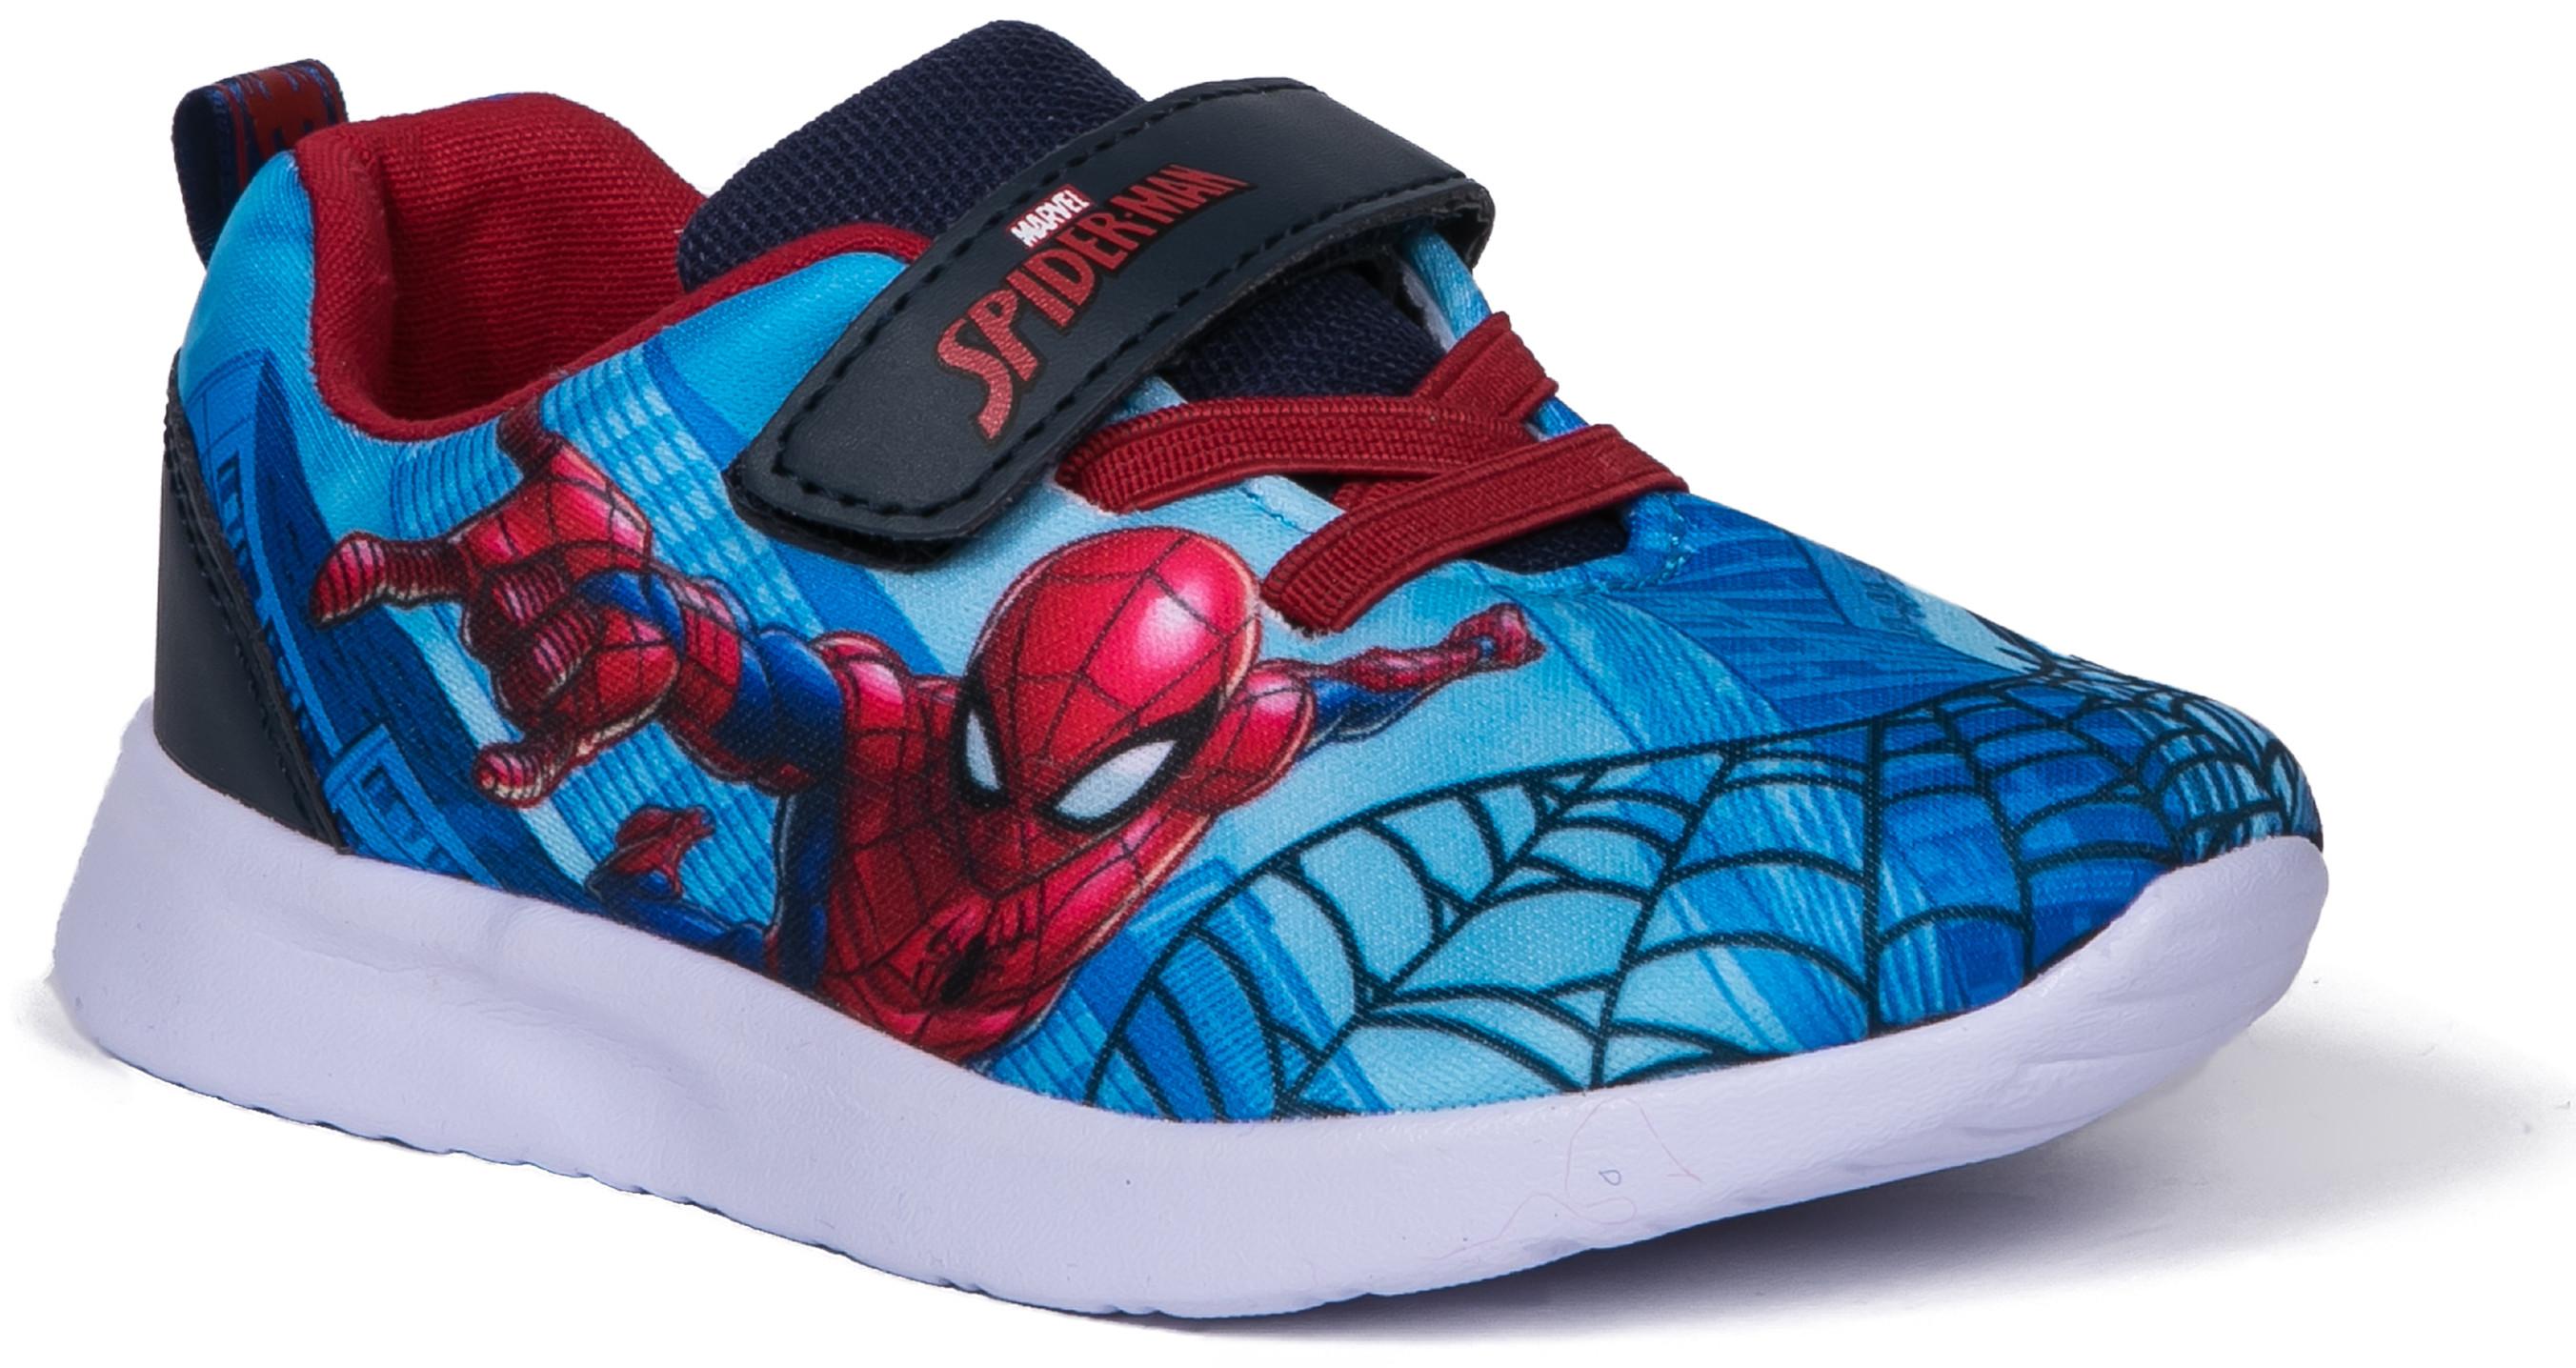 Кроссовки и кеды Barkito SPIDER-MAN SP005109 sideshow spiderman the amazing spider man pvc figure collectible model toy 2 colors 29cm